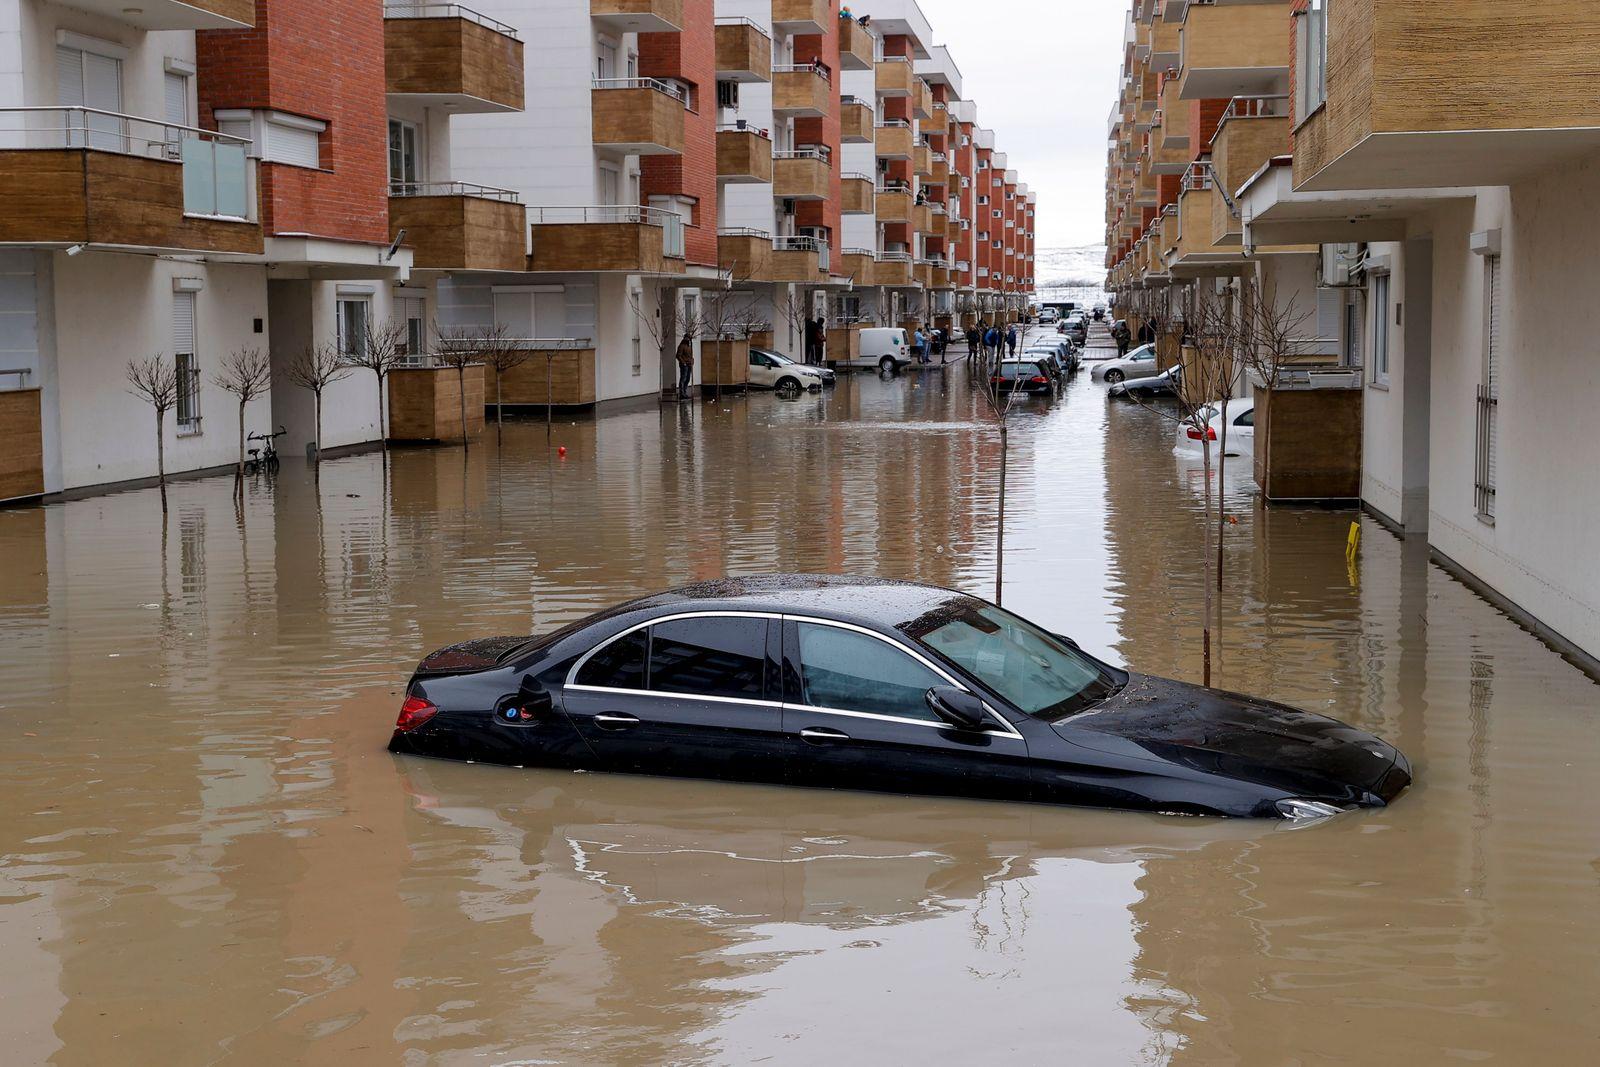 Heavy rain showers flooded different parts in Kosovo, Fushe Kosove, Serbia - 11 Jan 2021